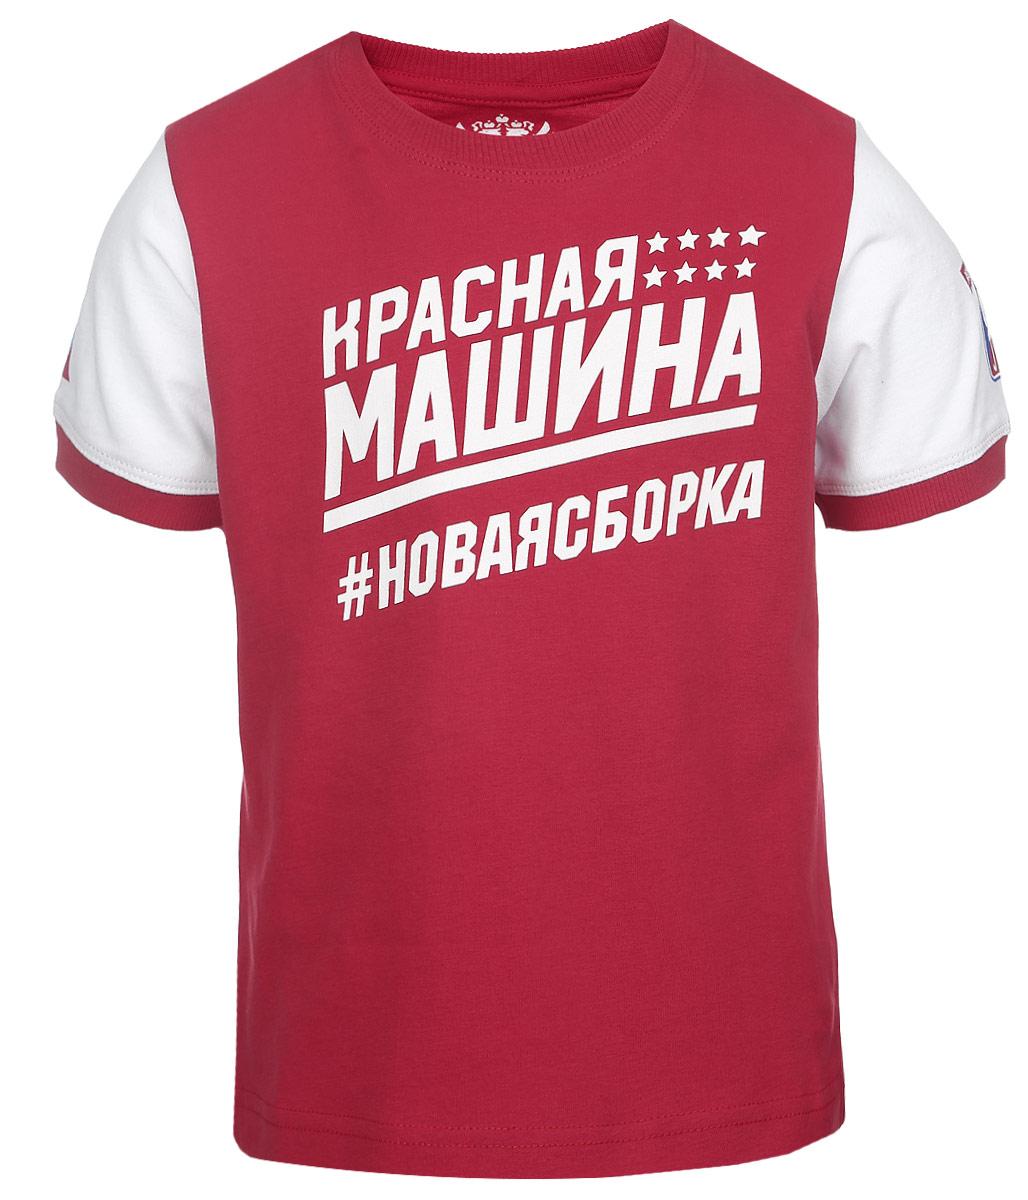 Футболка детская Красная Машина, цвет: красный, белый. 65160073. Размер 164 - Национальная Атрибутика